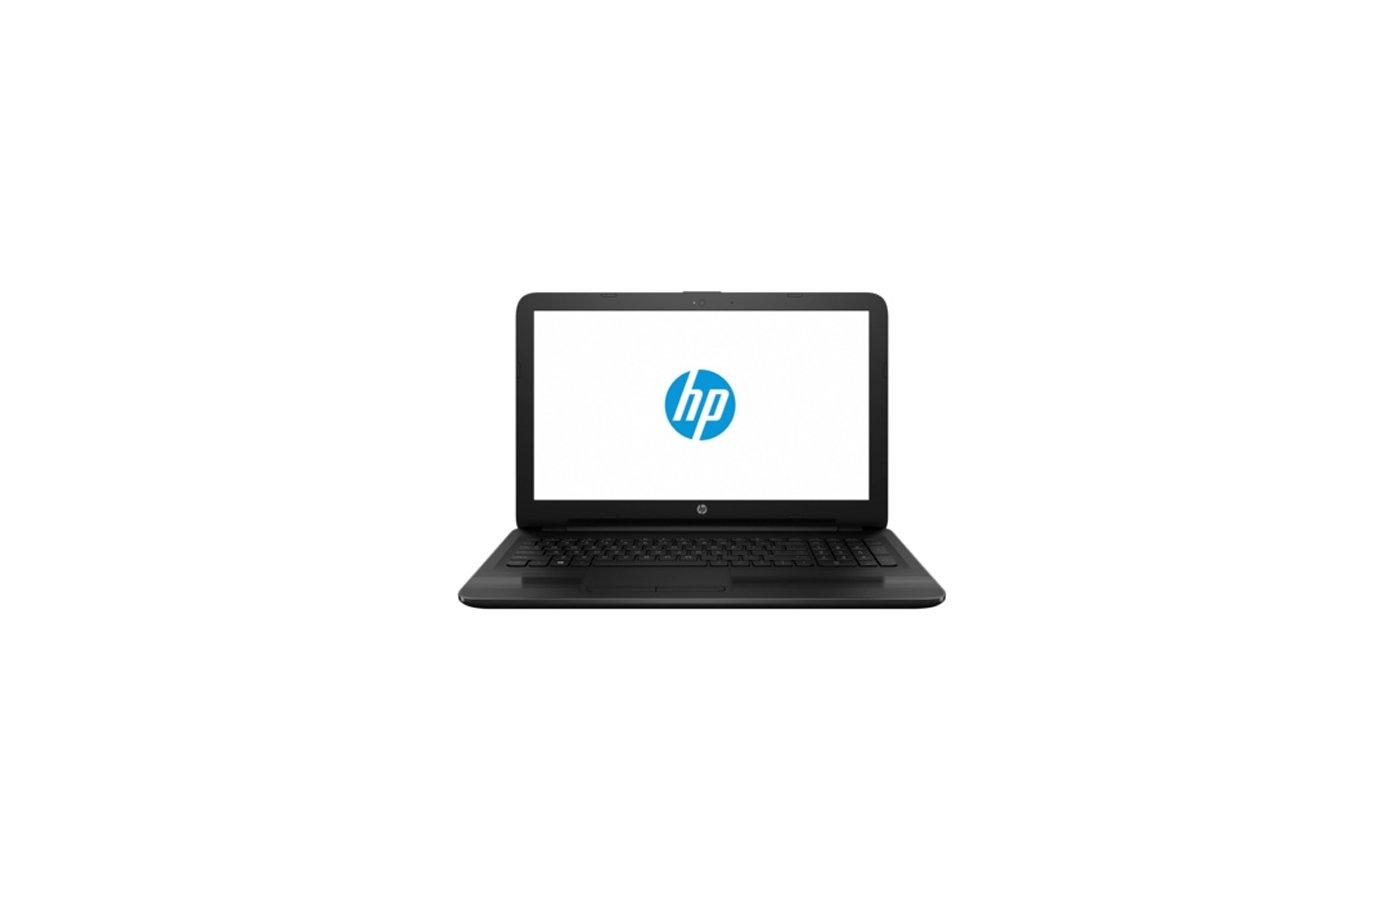 Ноутбук HP Pavilion 15-ba020UR /P3T26EA/ AMD A8 7410/4Gb/500Gb/DVDRW/R5 2Gb/15.6/Win10